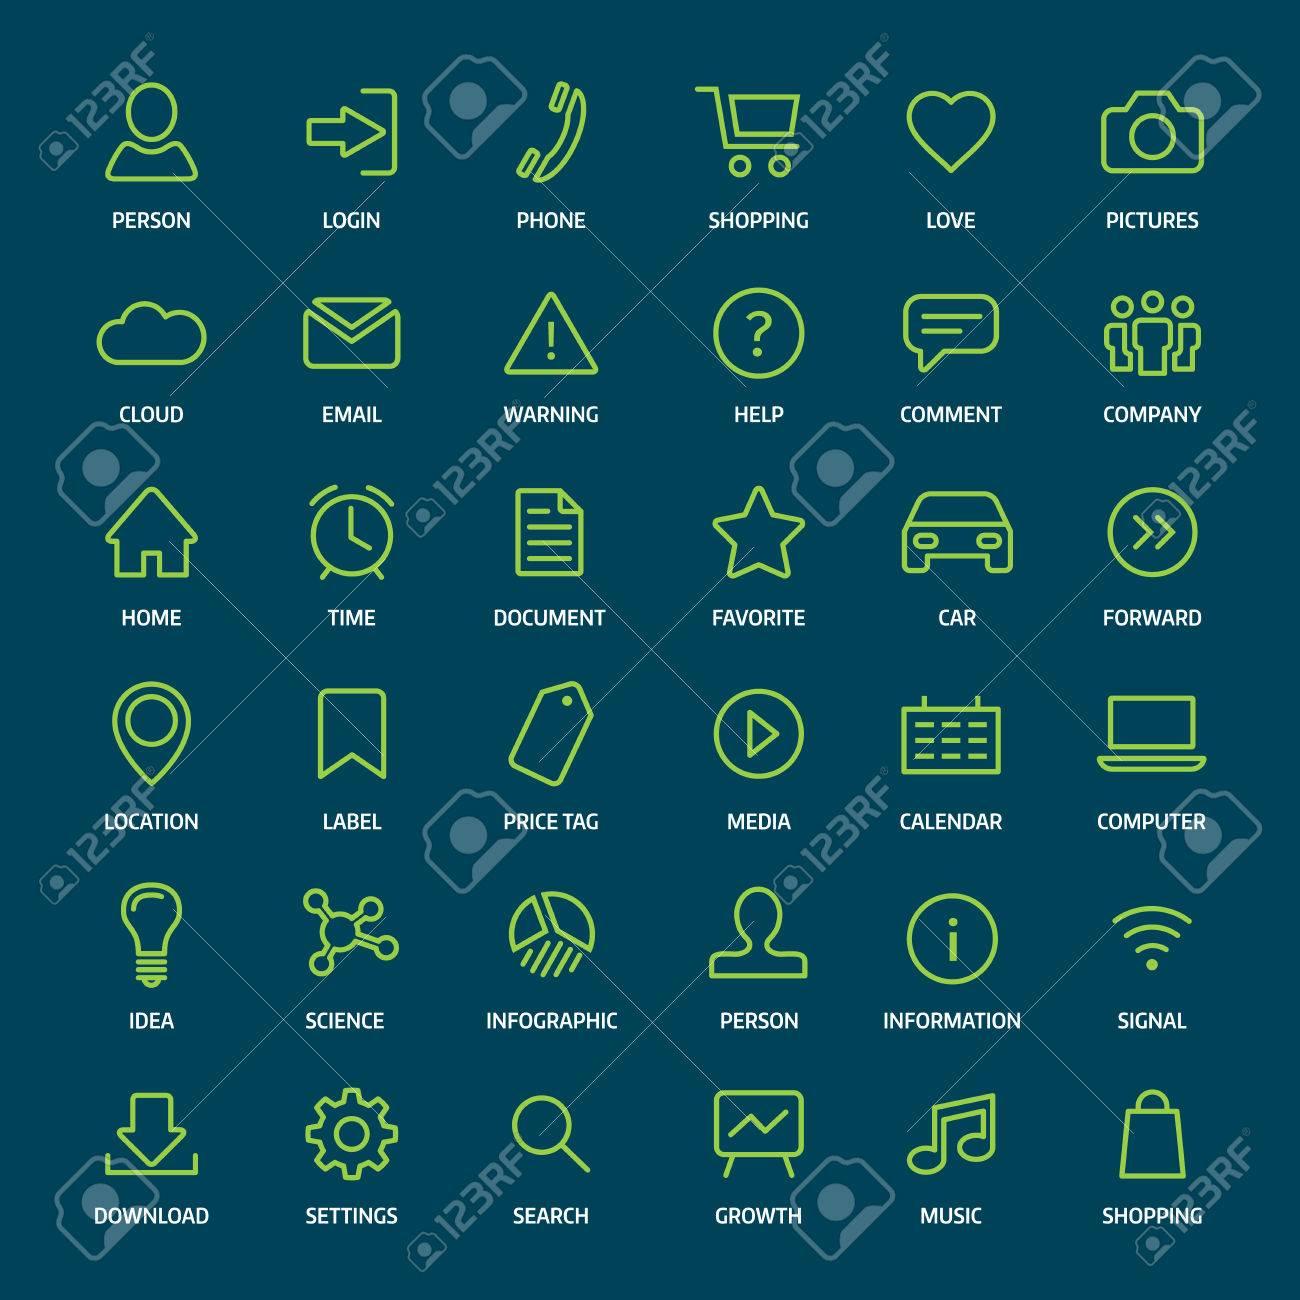 Bedeutung symbole Adinkra Symbols